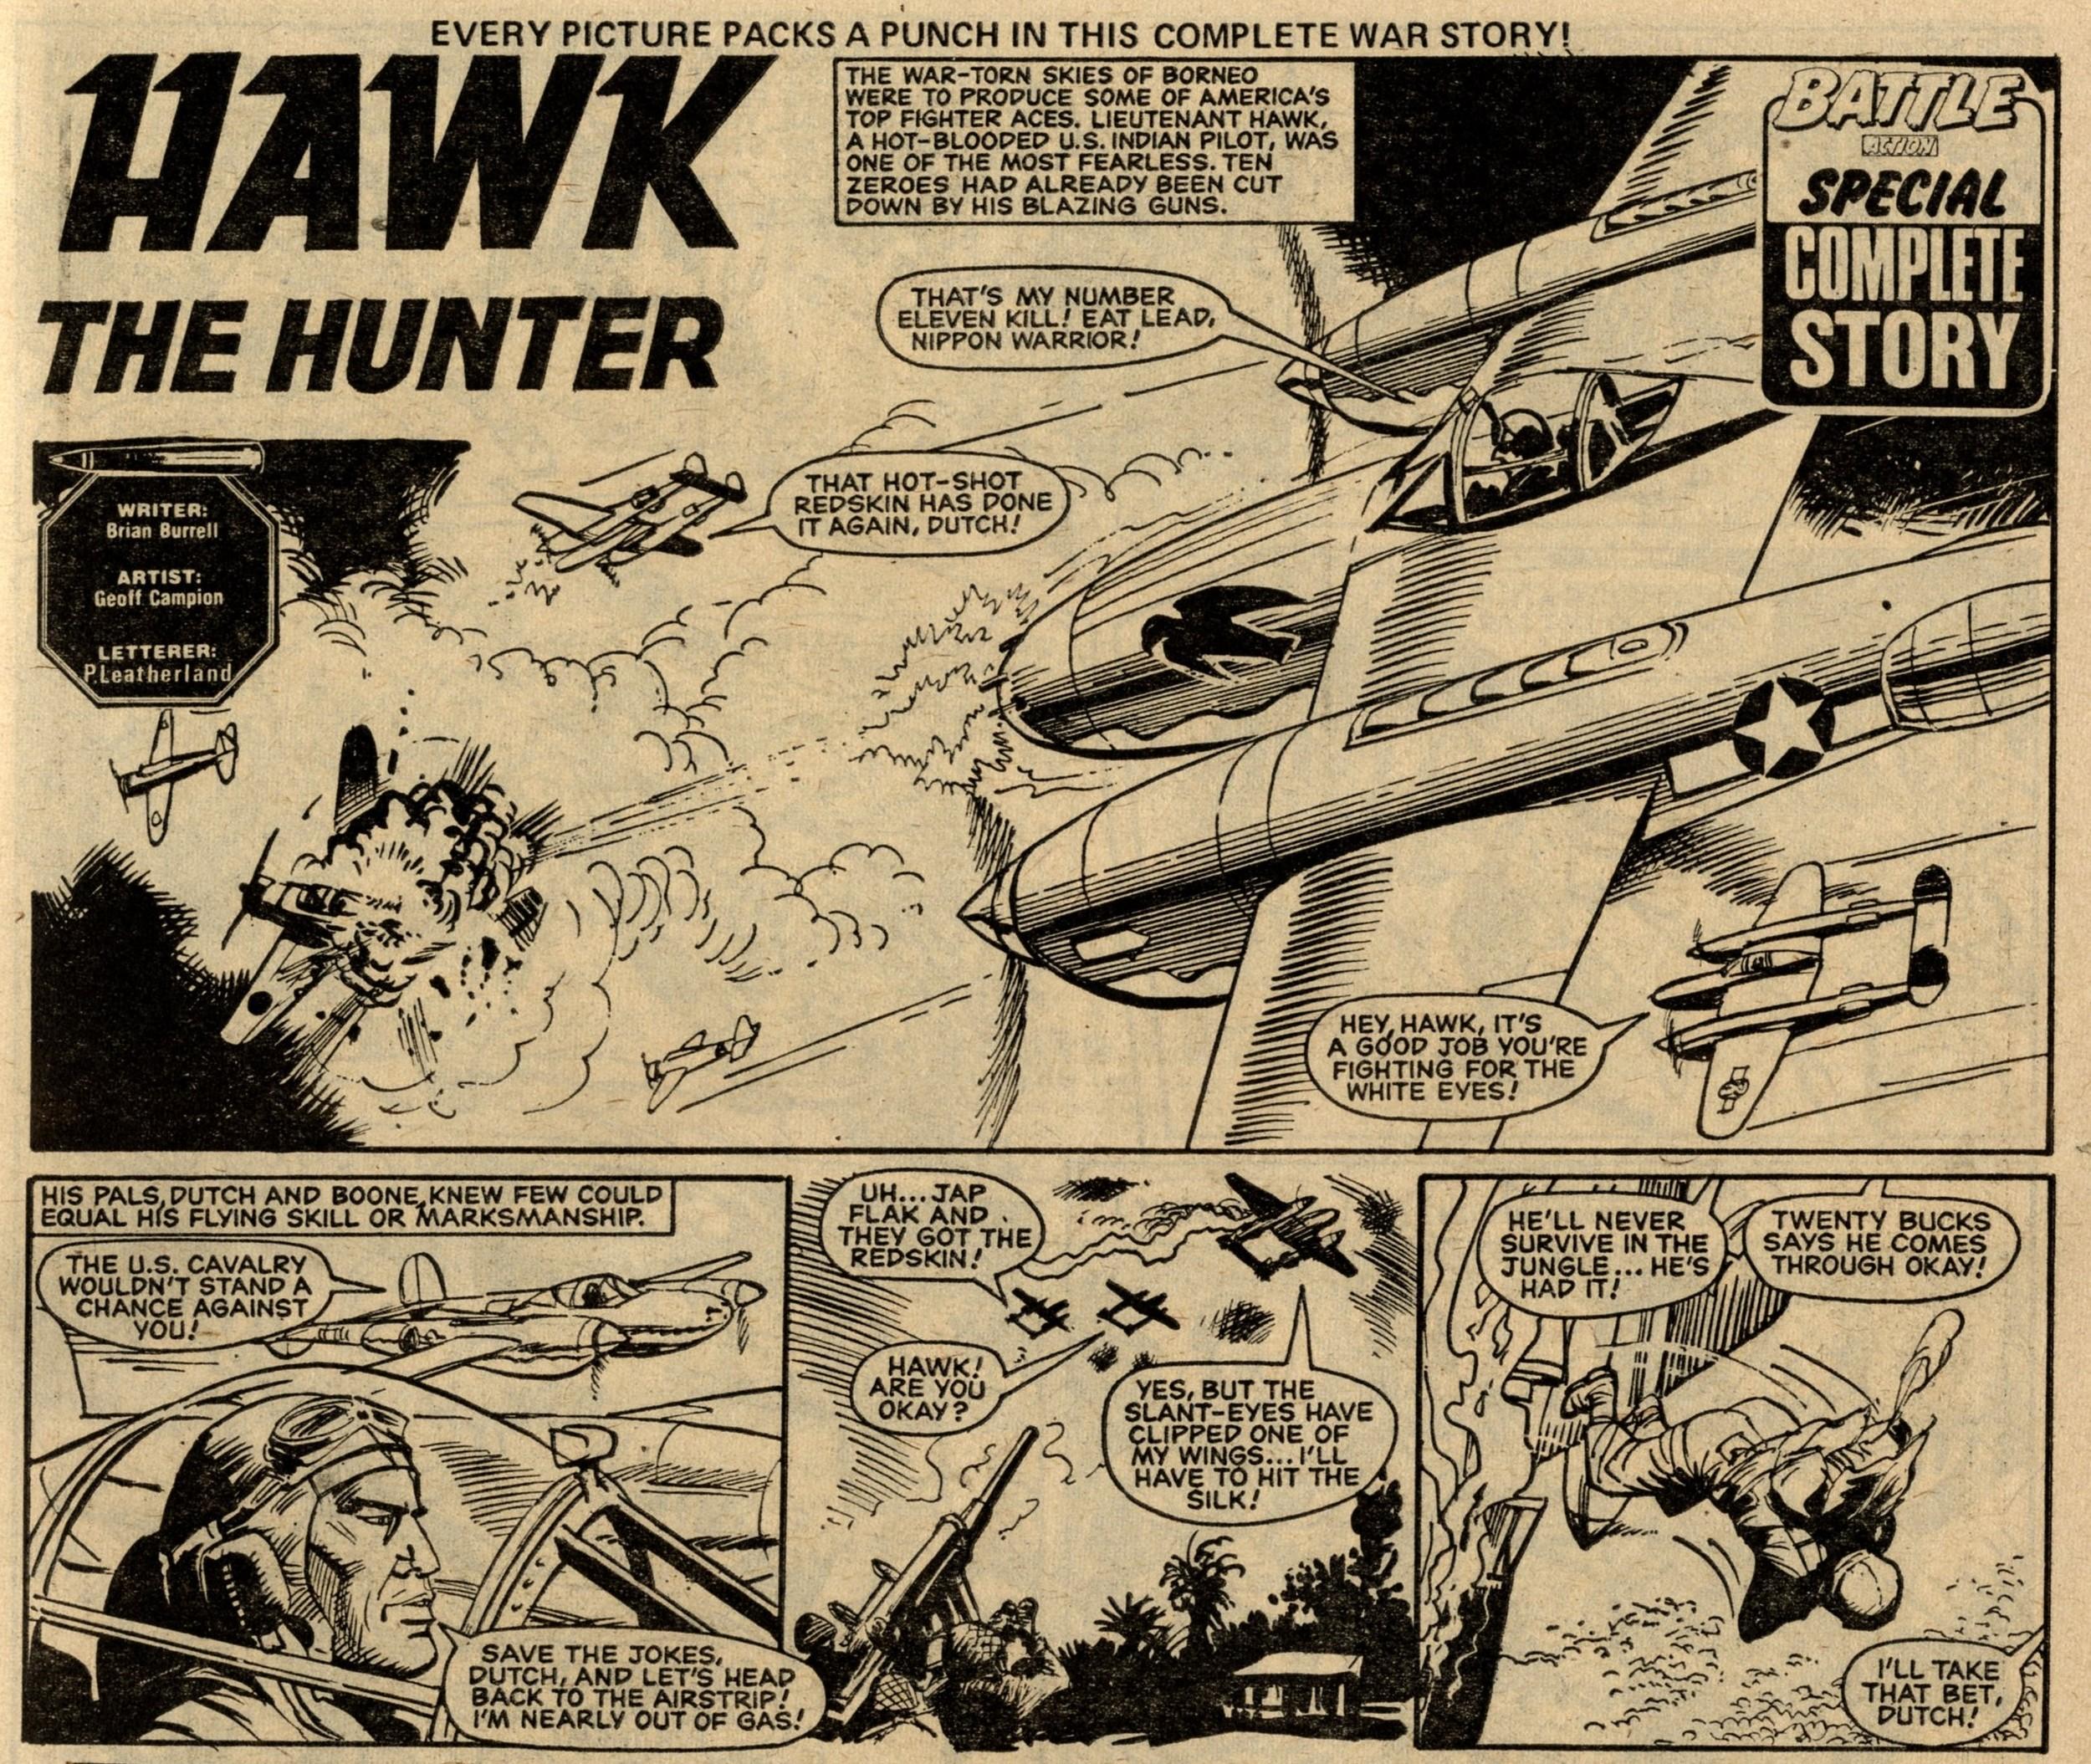 Hawk the Hunter: Brian Burrell (writer), Geoff Campion (artist)